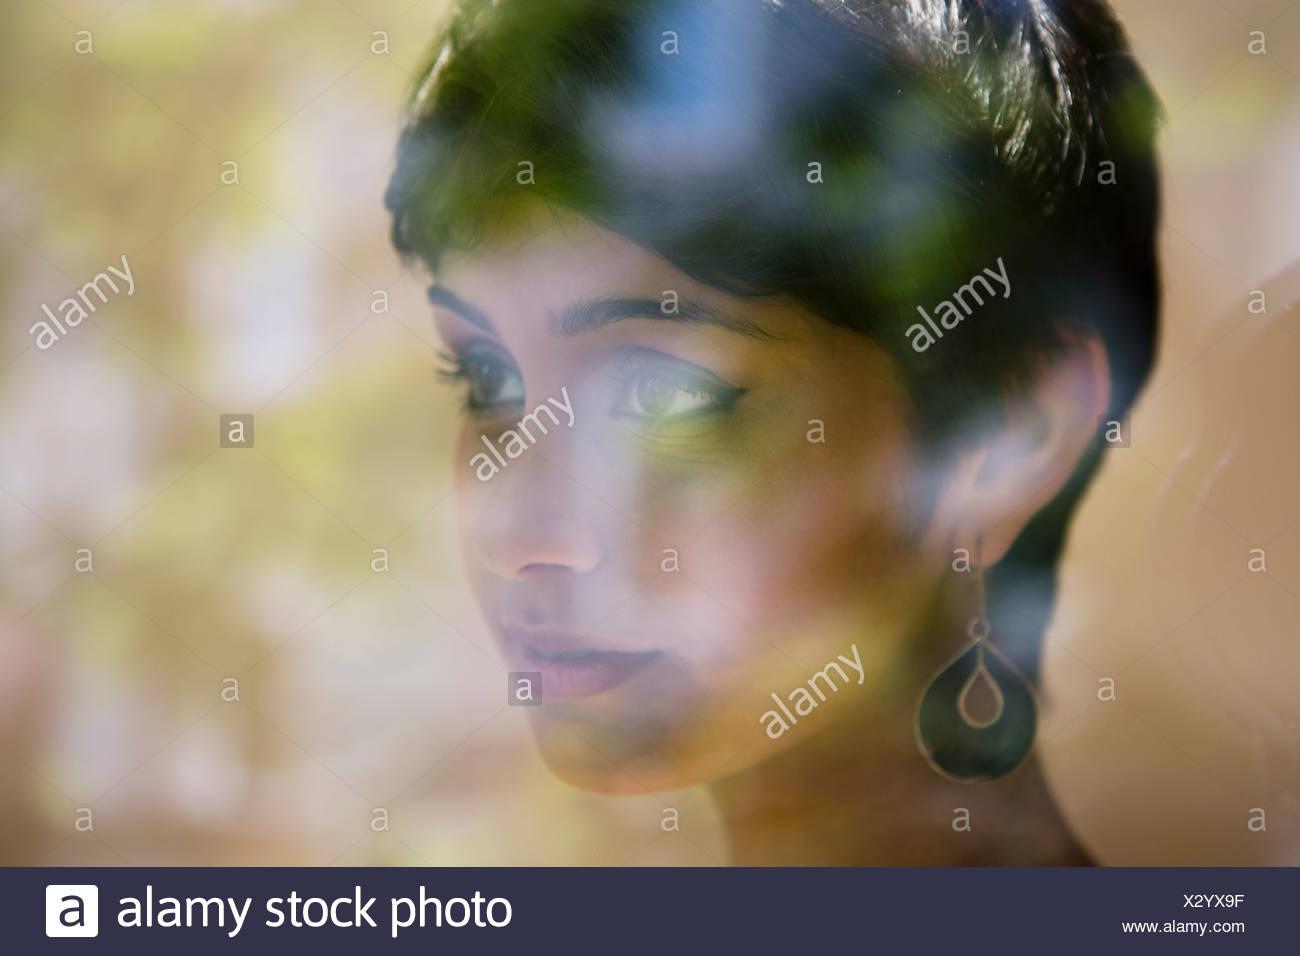 Retrato de mujer con pelo corto Imagen De Stock